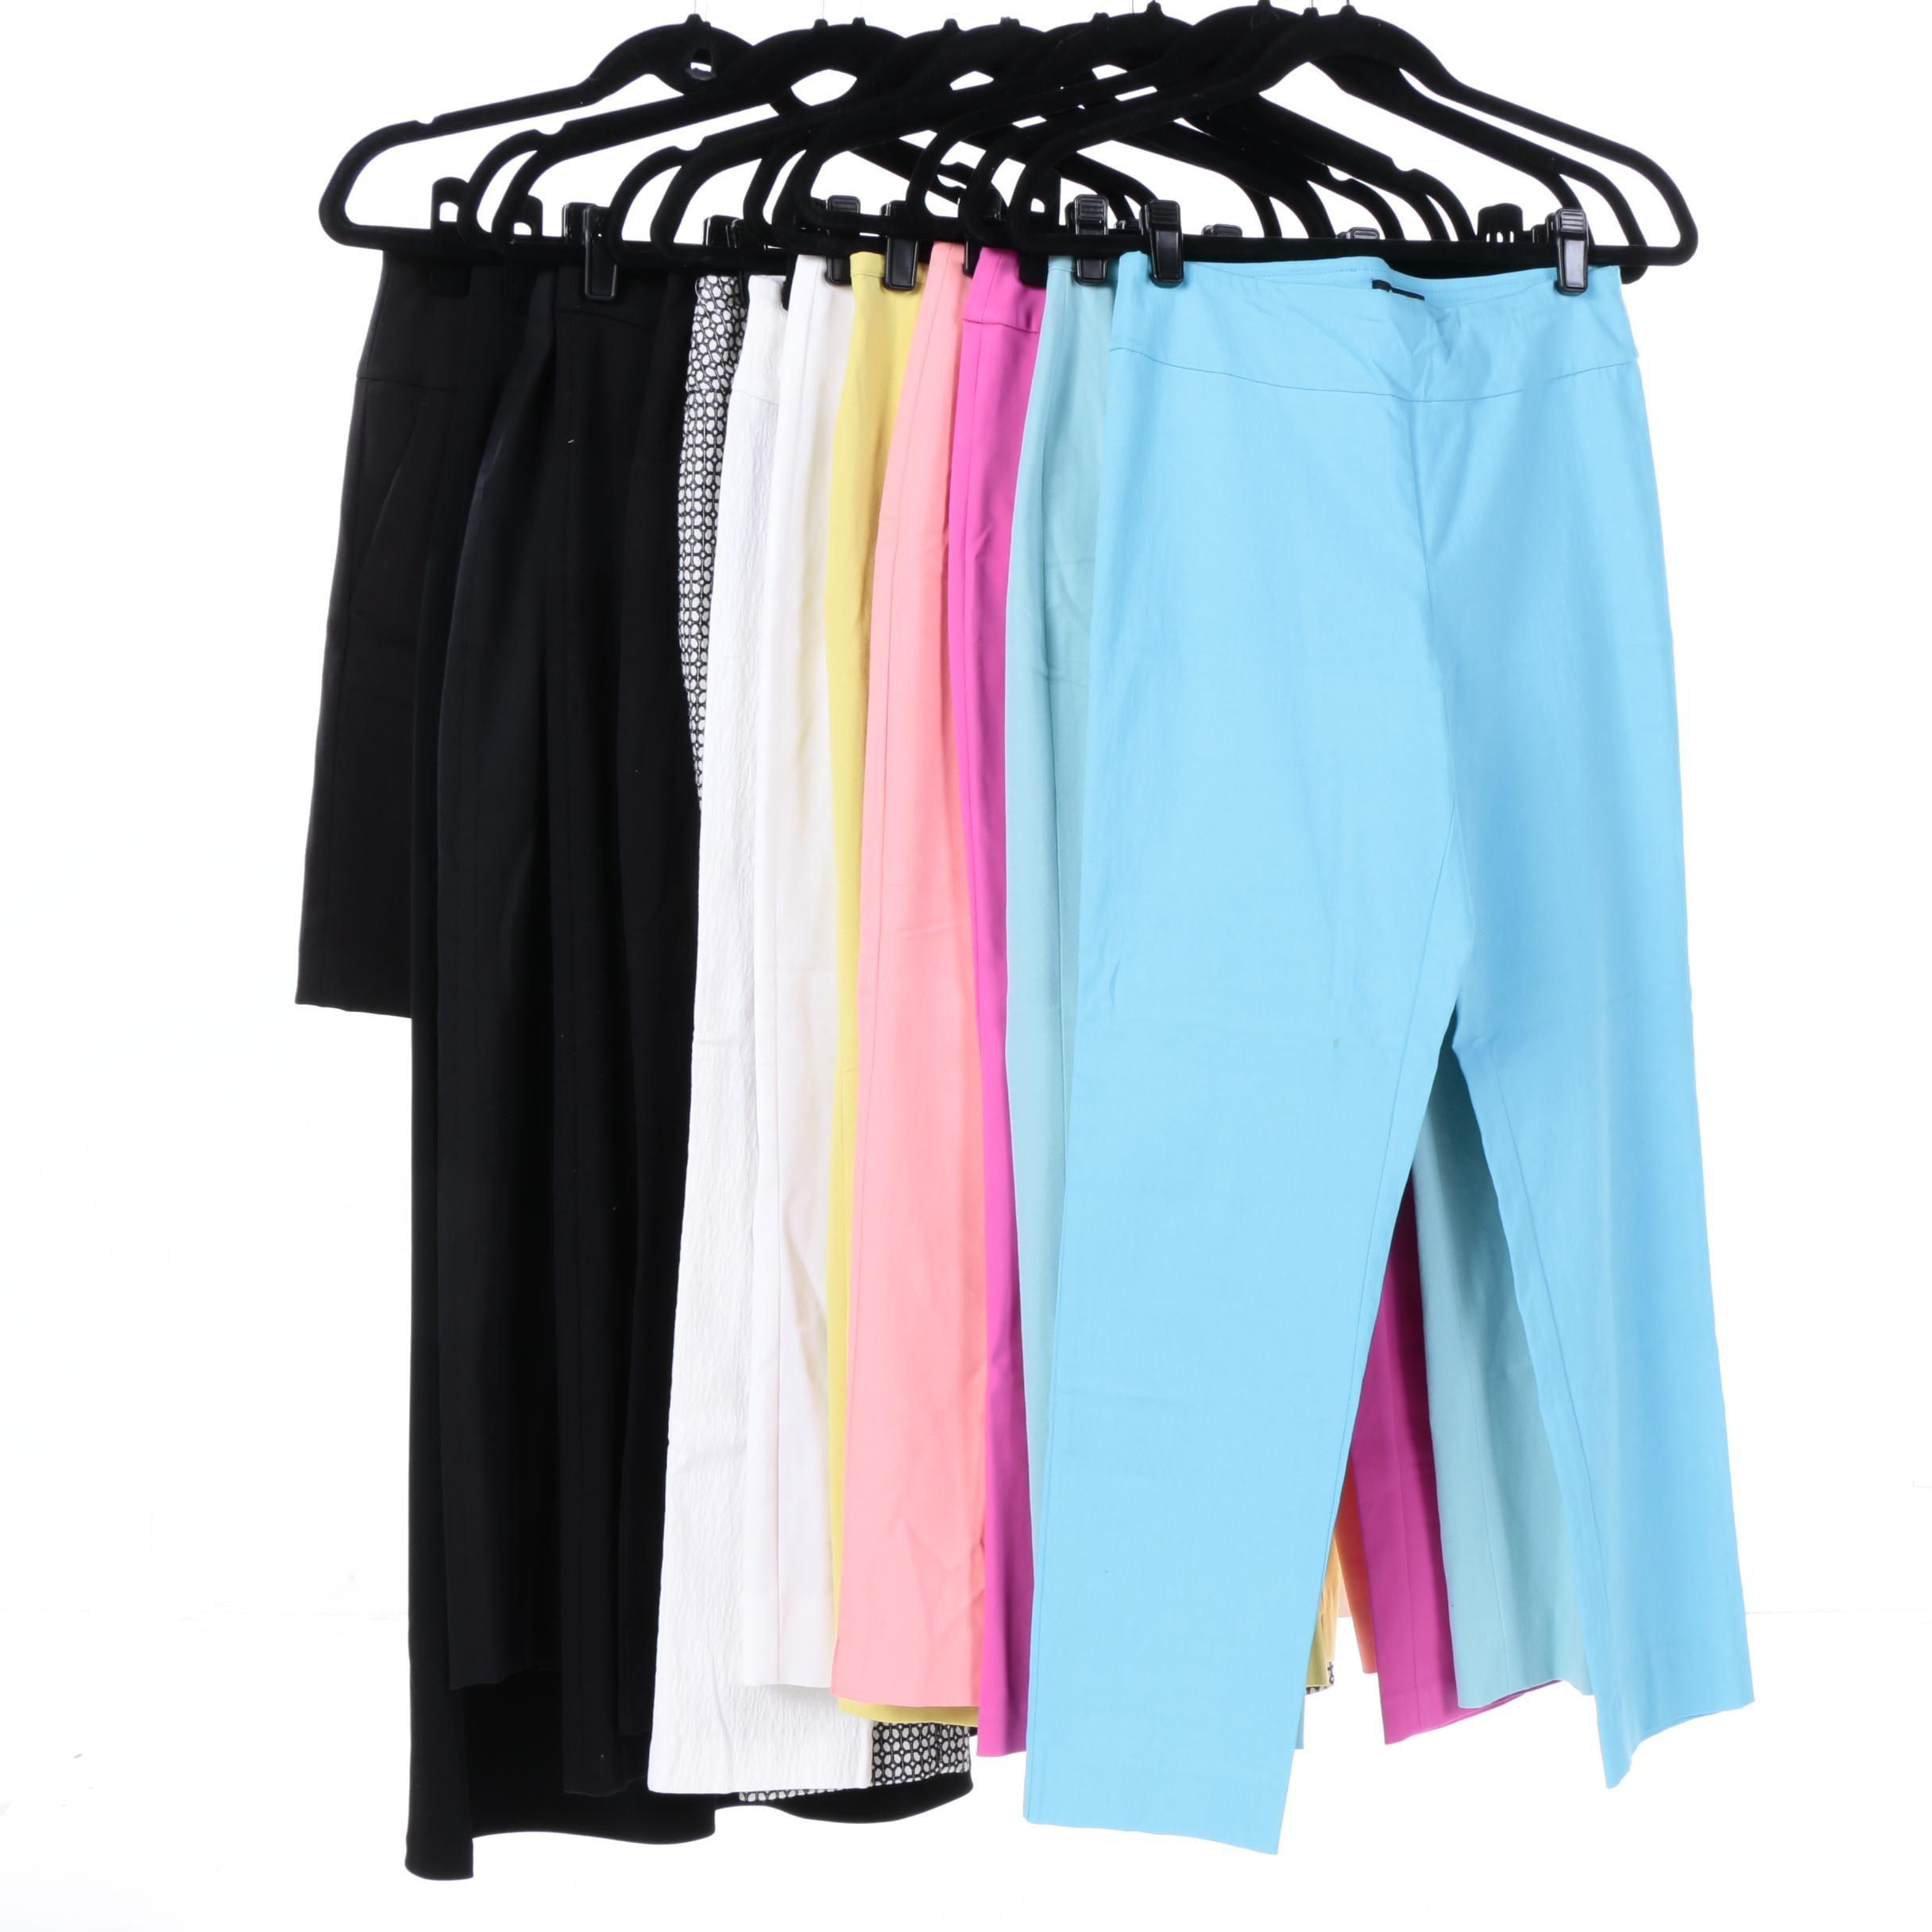 Women's Pants and Skirts Including Ann Taylor Loft, Tahari and St. John Sport